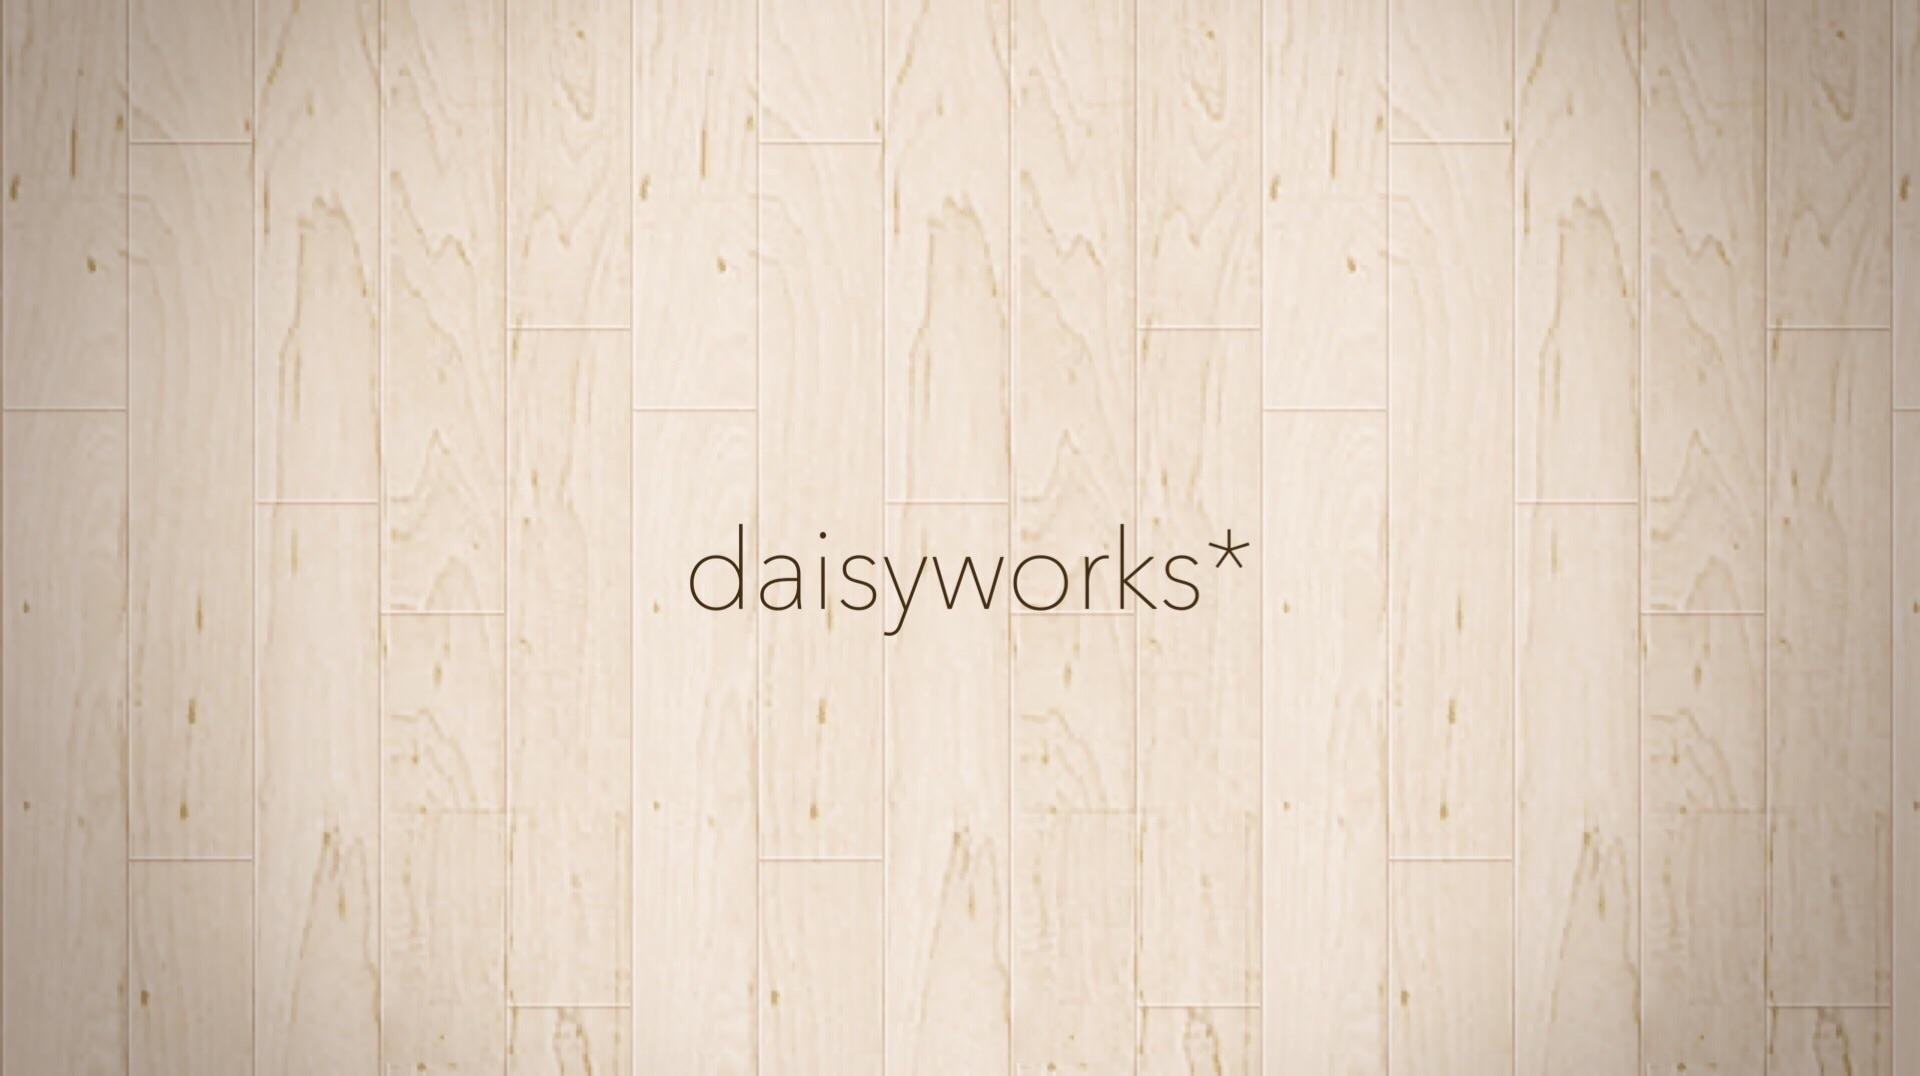 daisyworks*